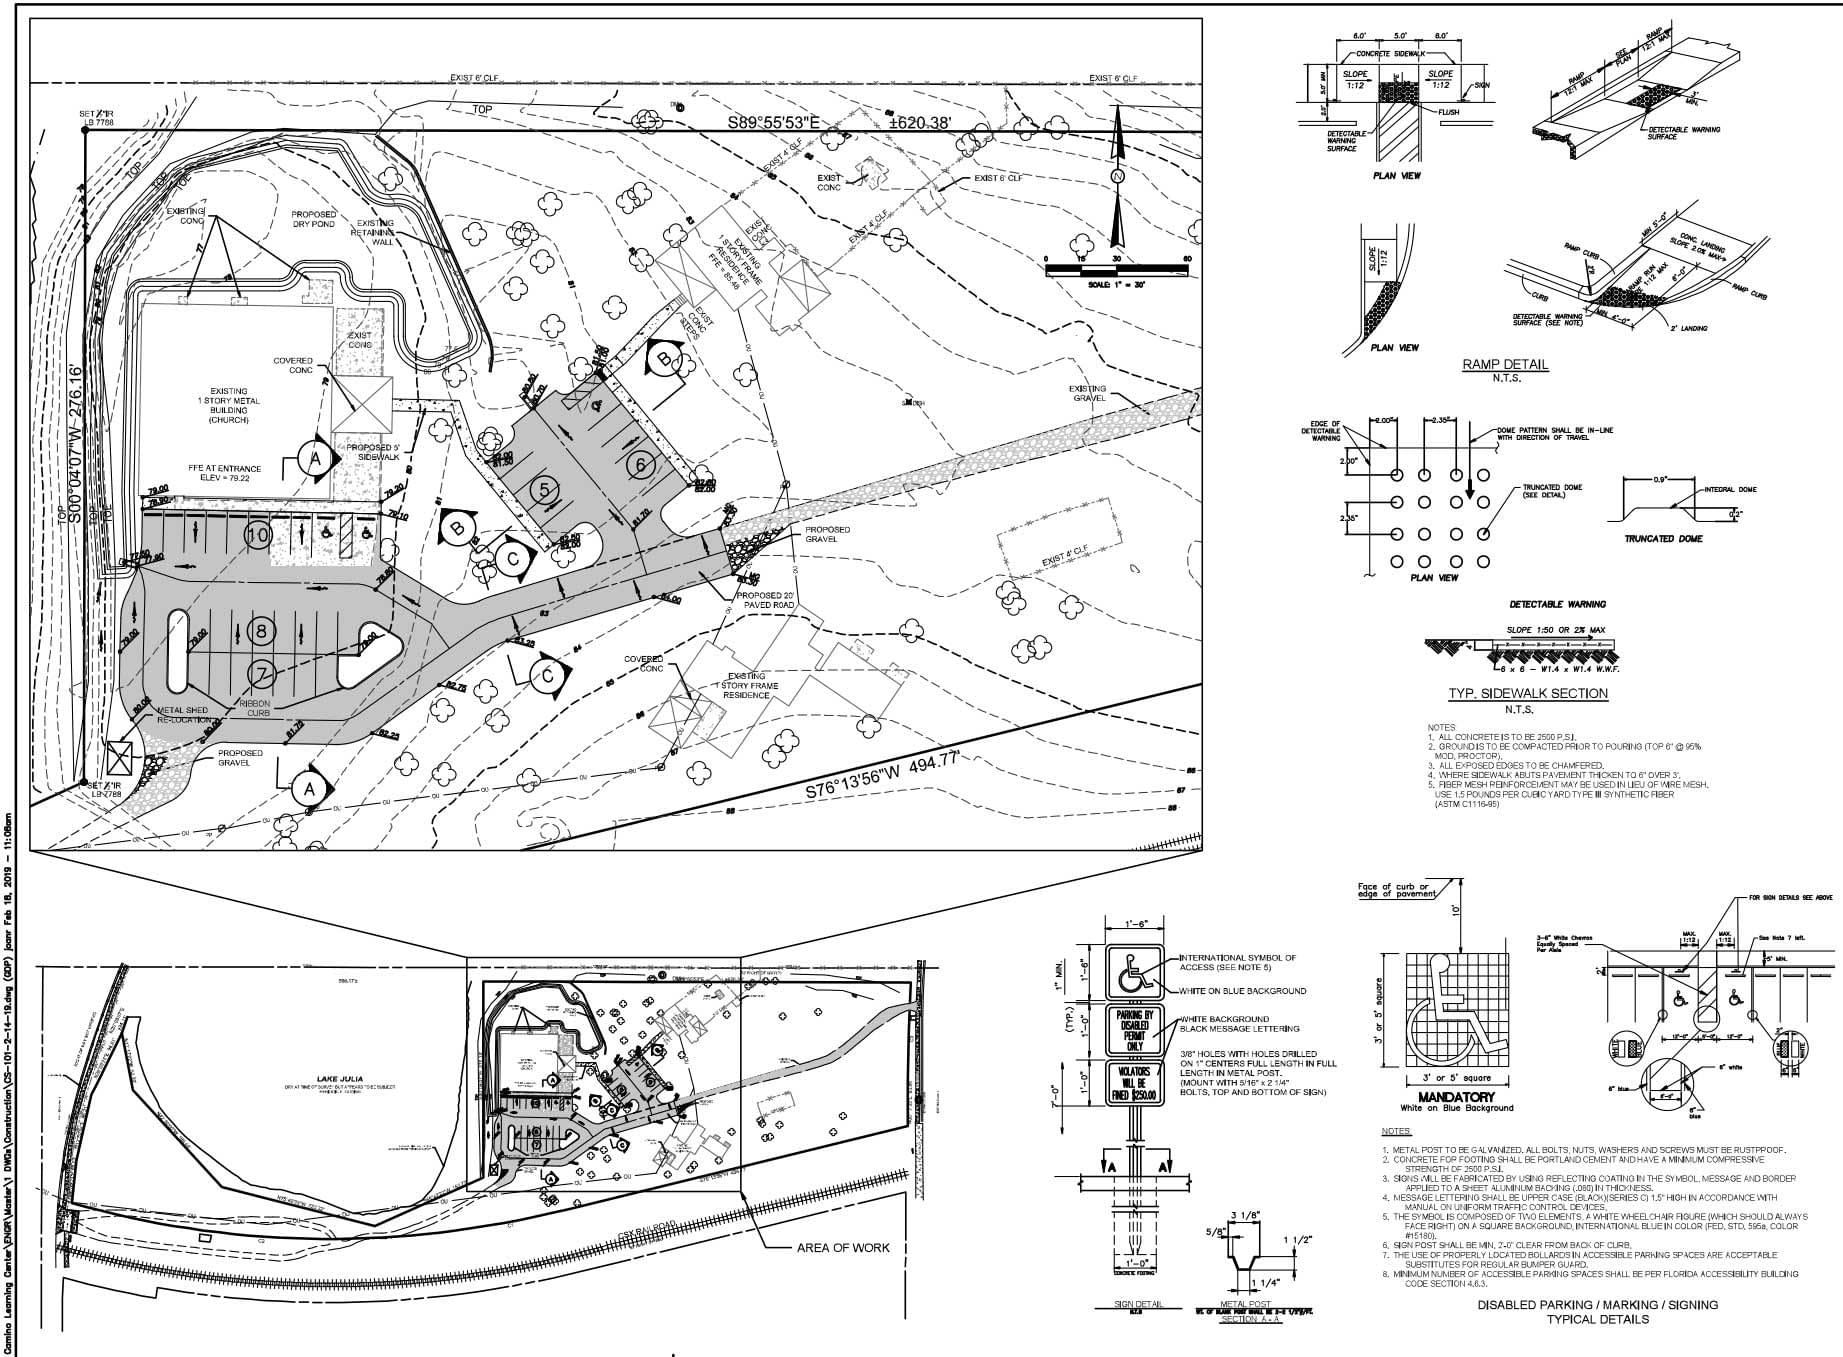 Iglesia Hispana El Camino site plan